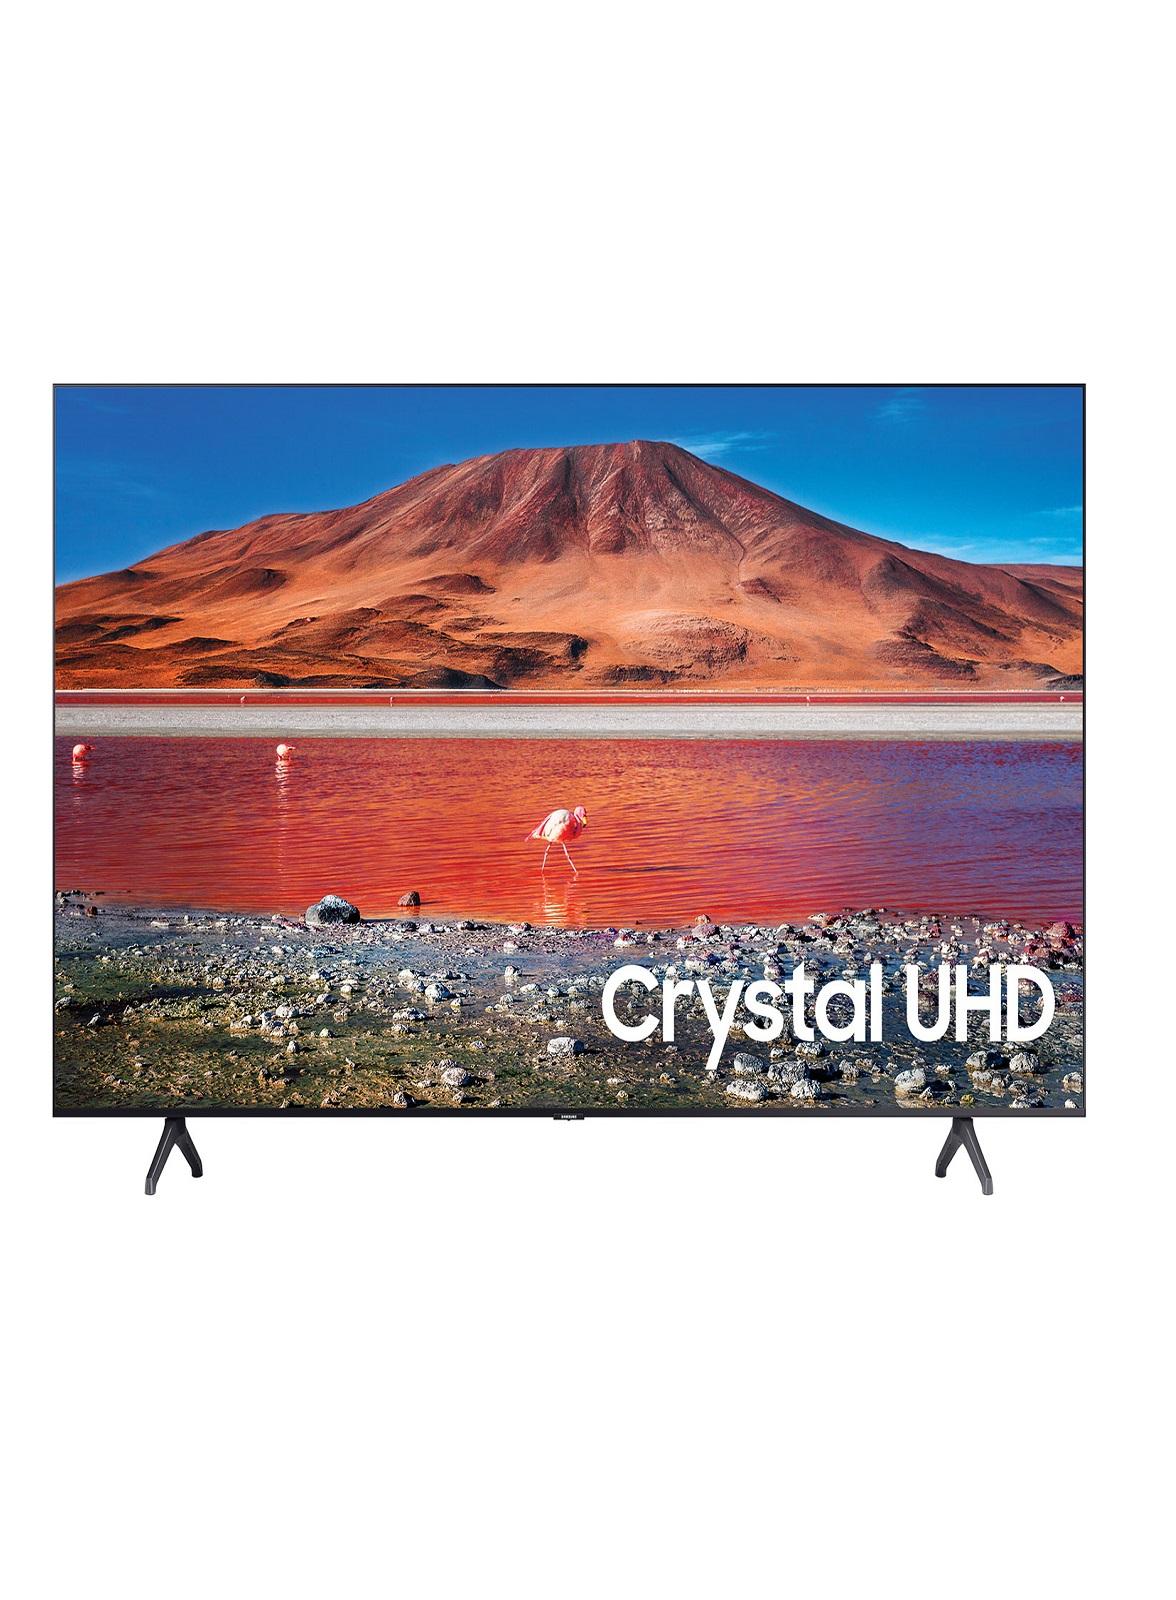 Samsung TU7000 Crystal UHD 4K Smart TV 75 شاشة تلفاز